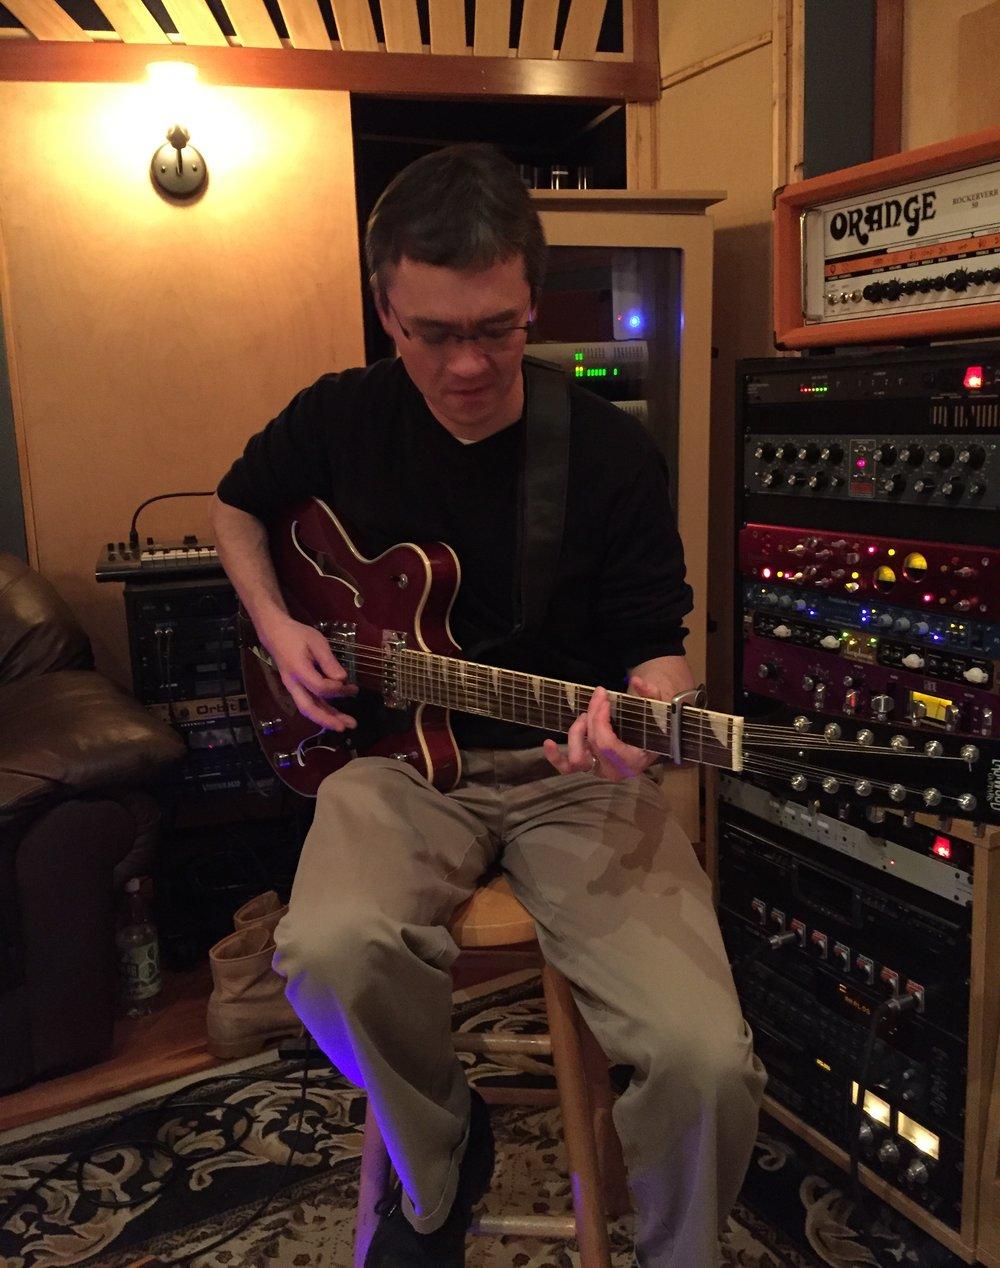 Guitarist Myron Kibbee recording 12 string guitar.